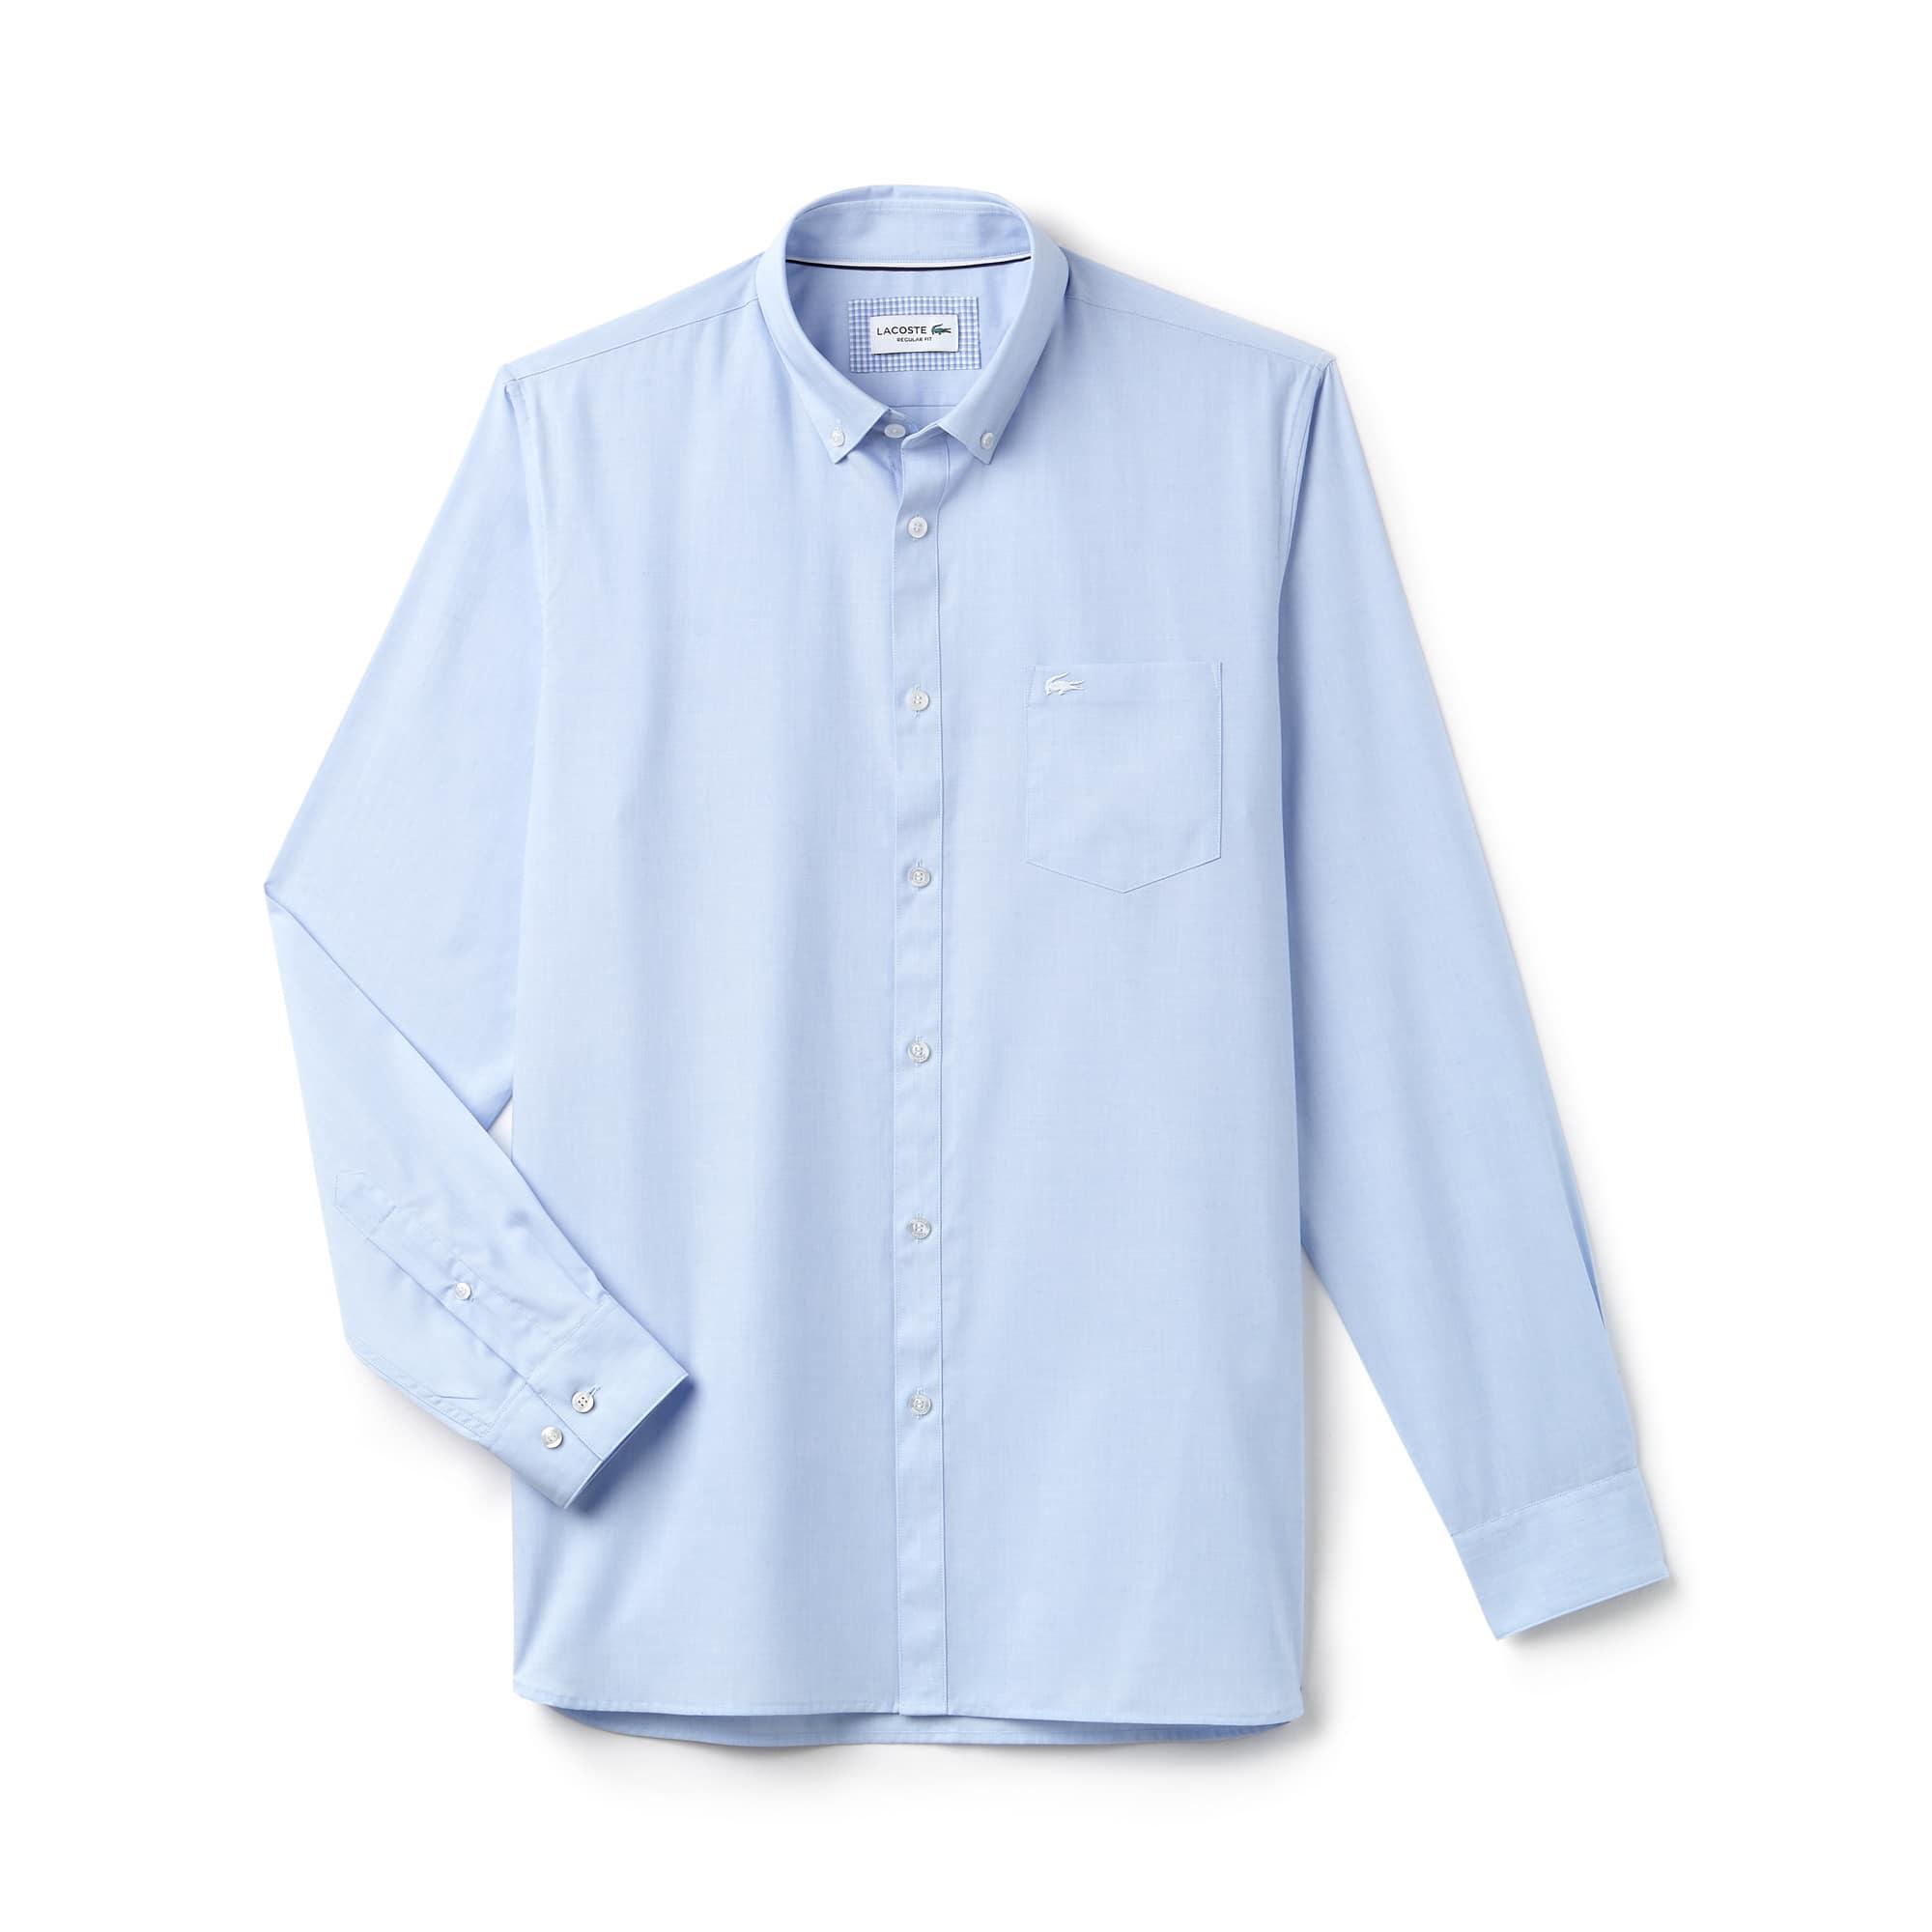 Camisa regular fit de hilo a hilo de algodón liso